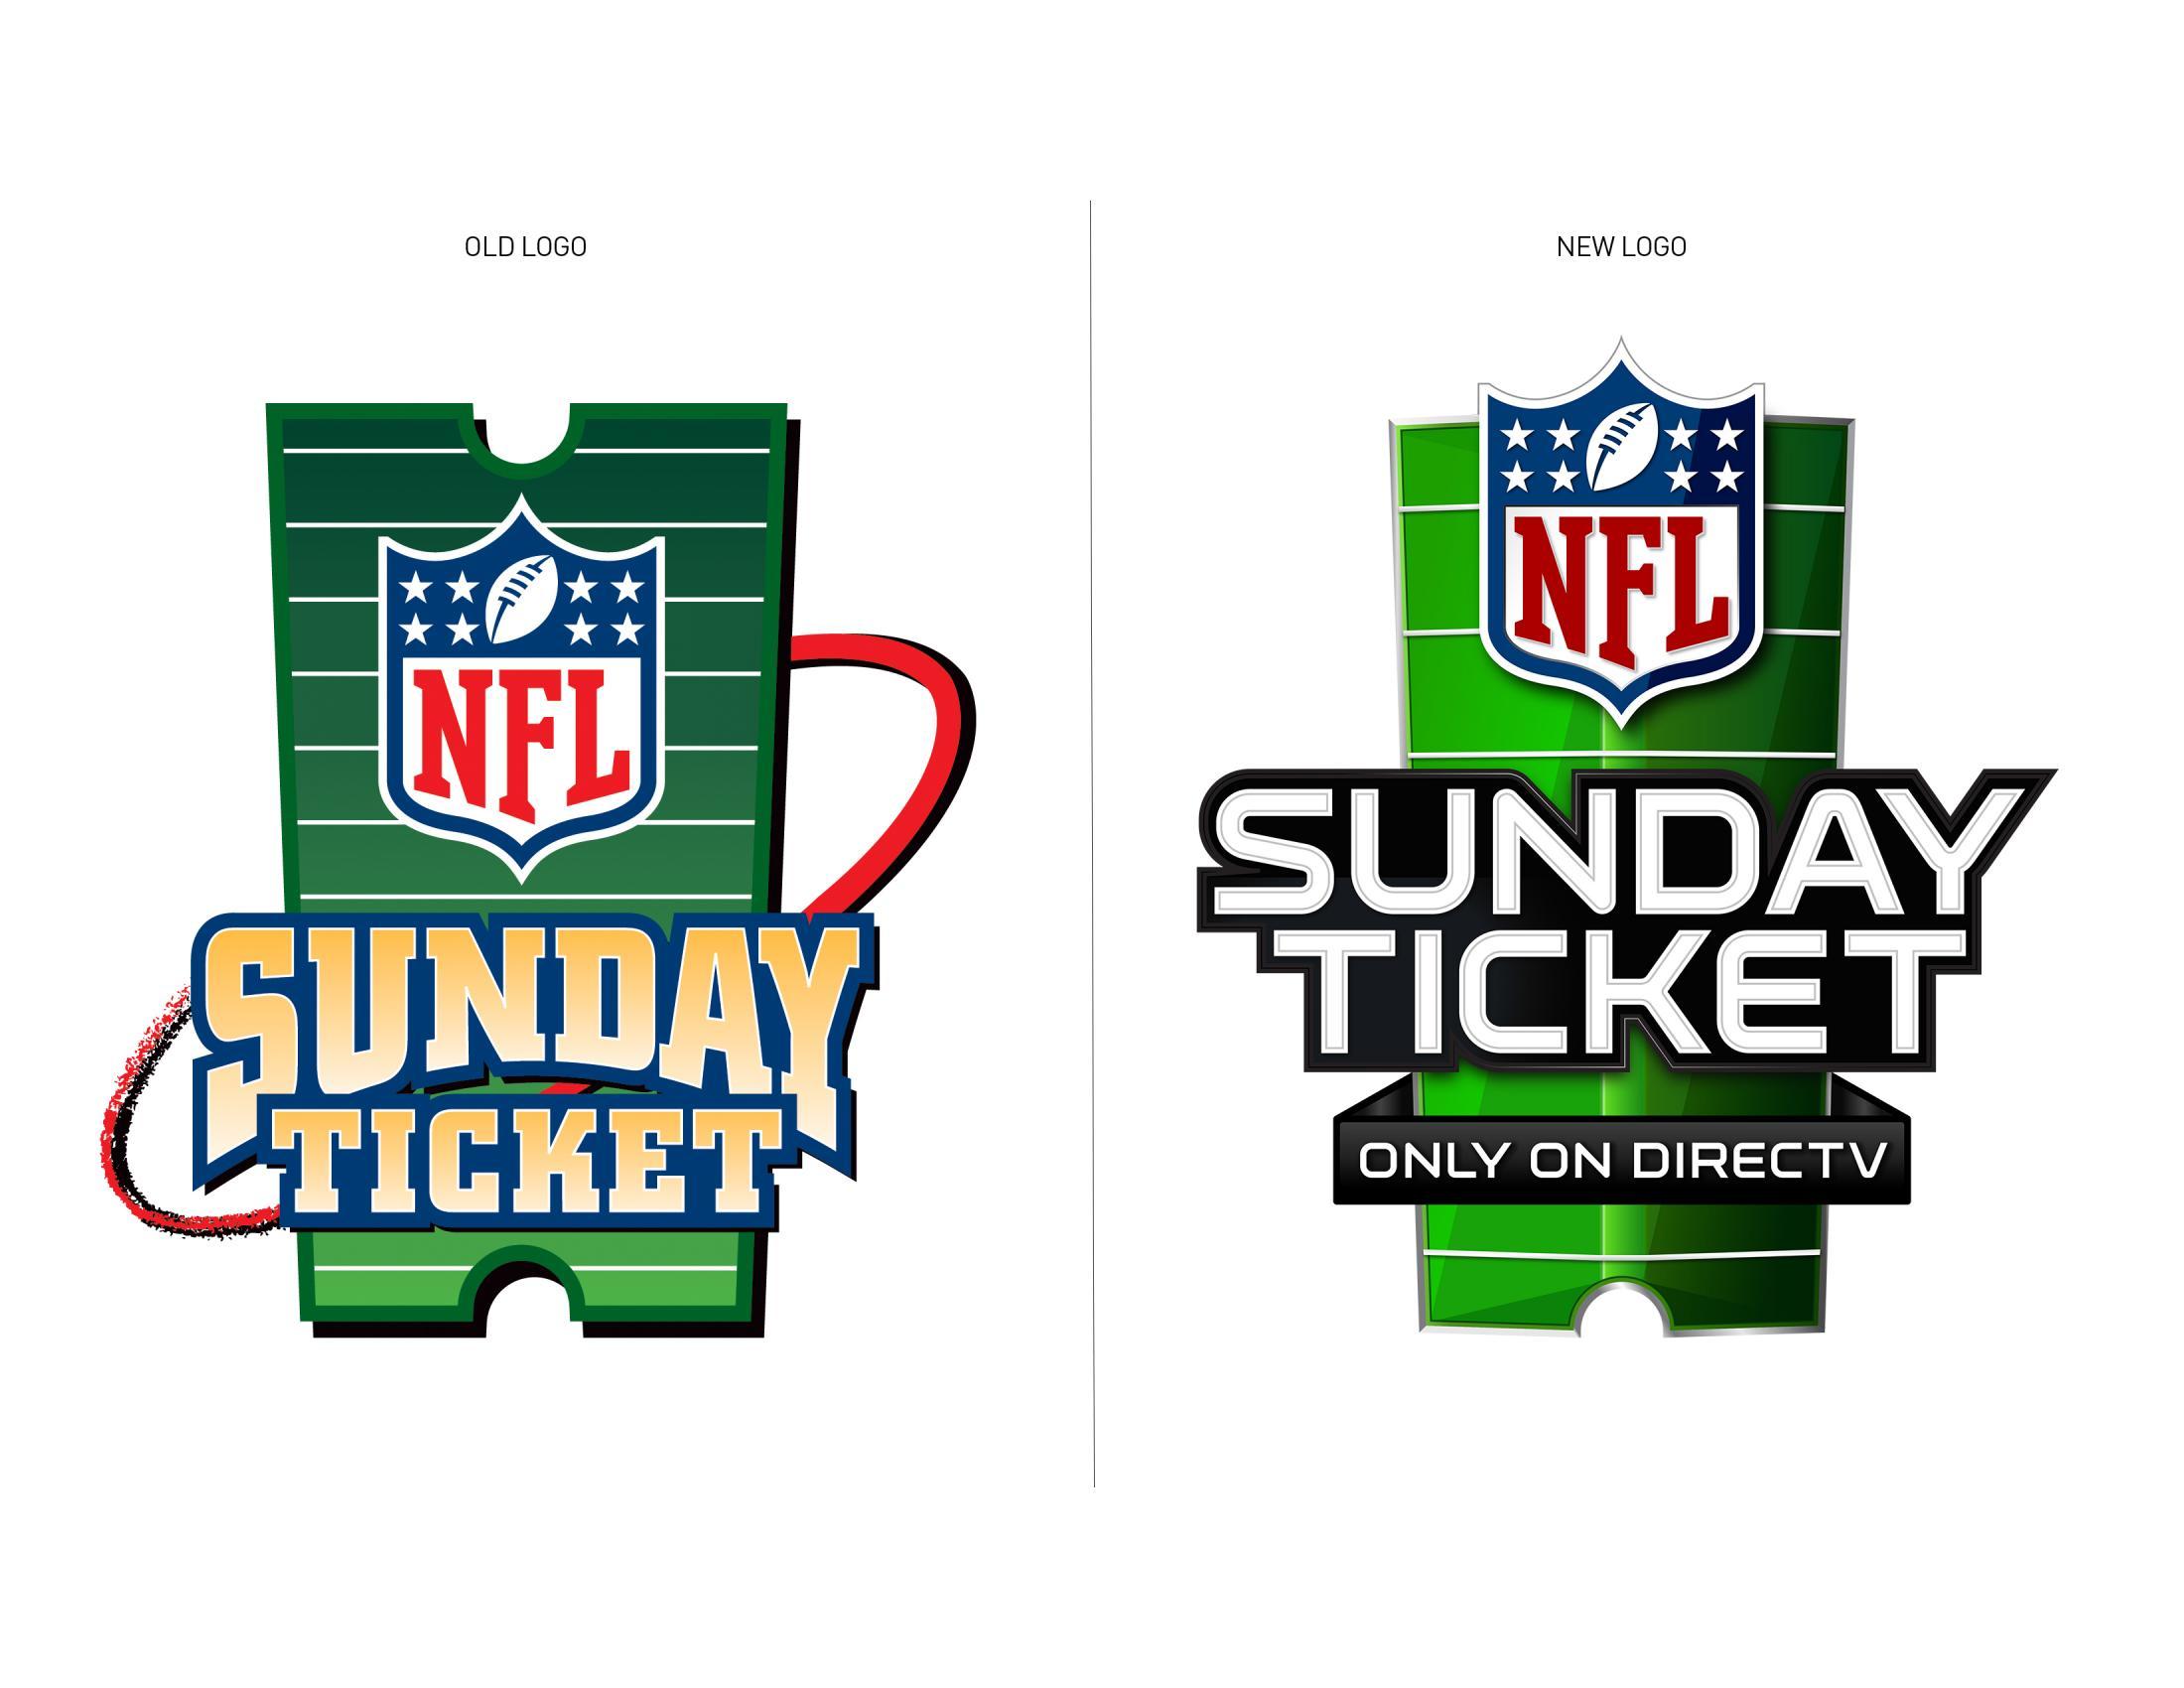 directv nfl sunday ticket on directv logo redesign clios rh clios com nfl sunday ticket login nfl sunday ticket login online